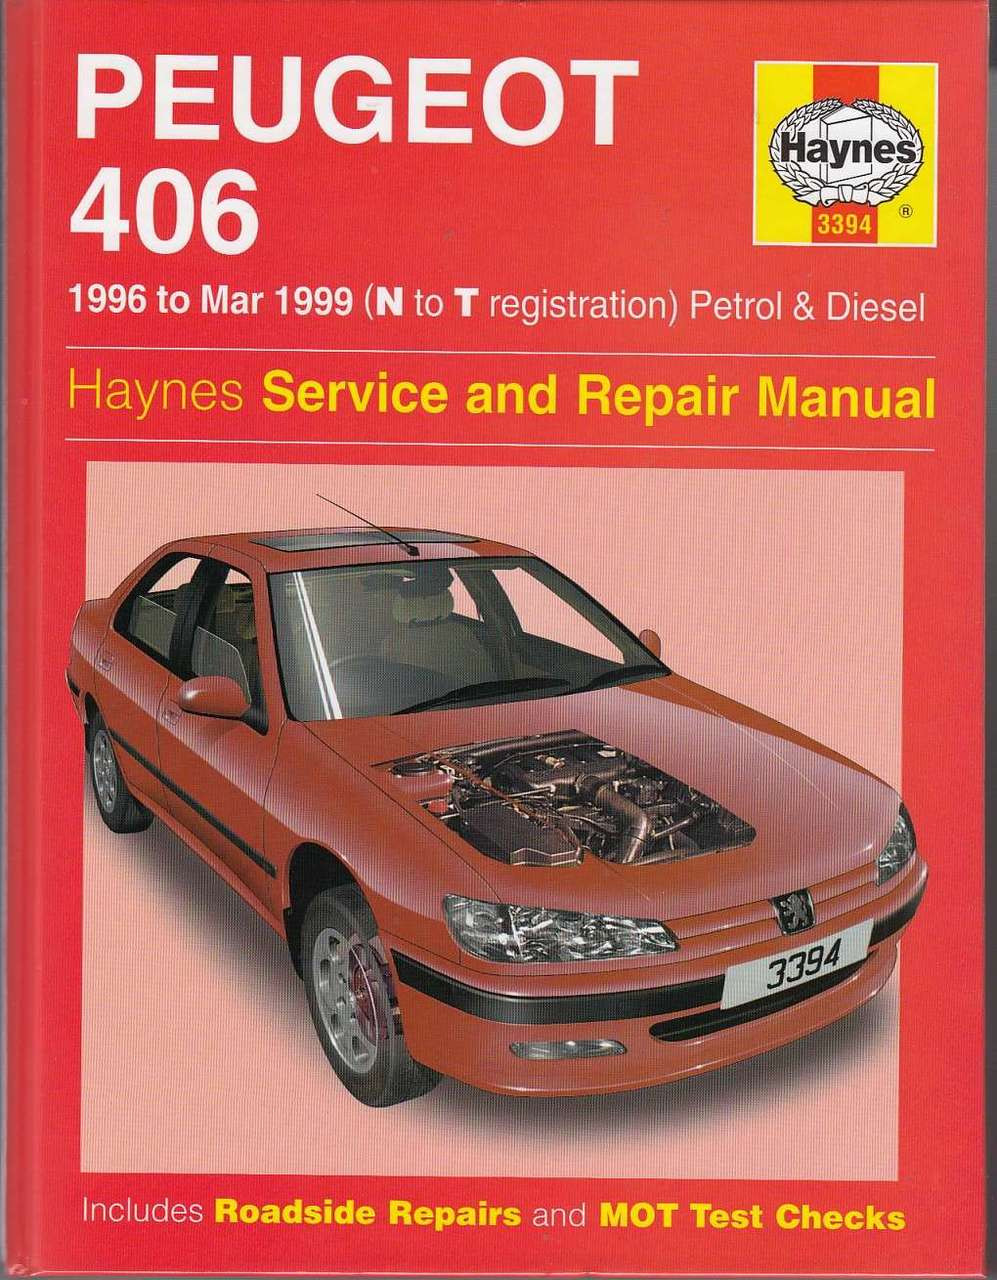 Peugeot 406 Workshop Manual ...